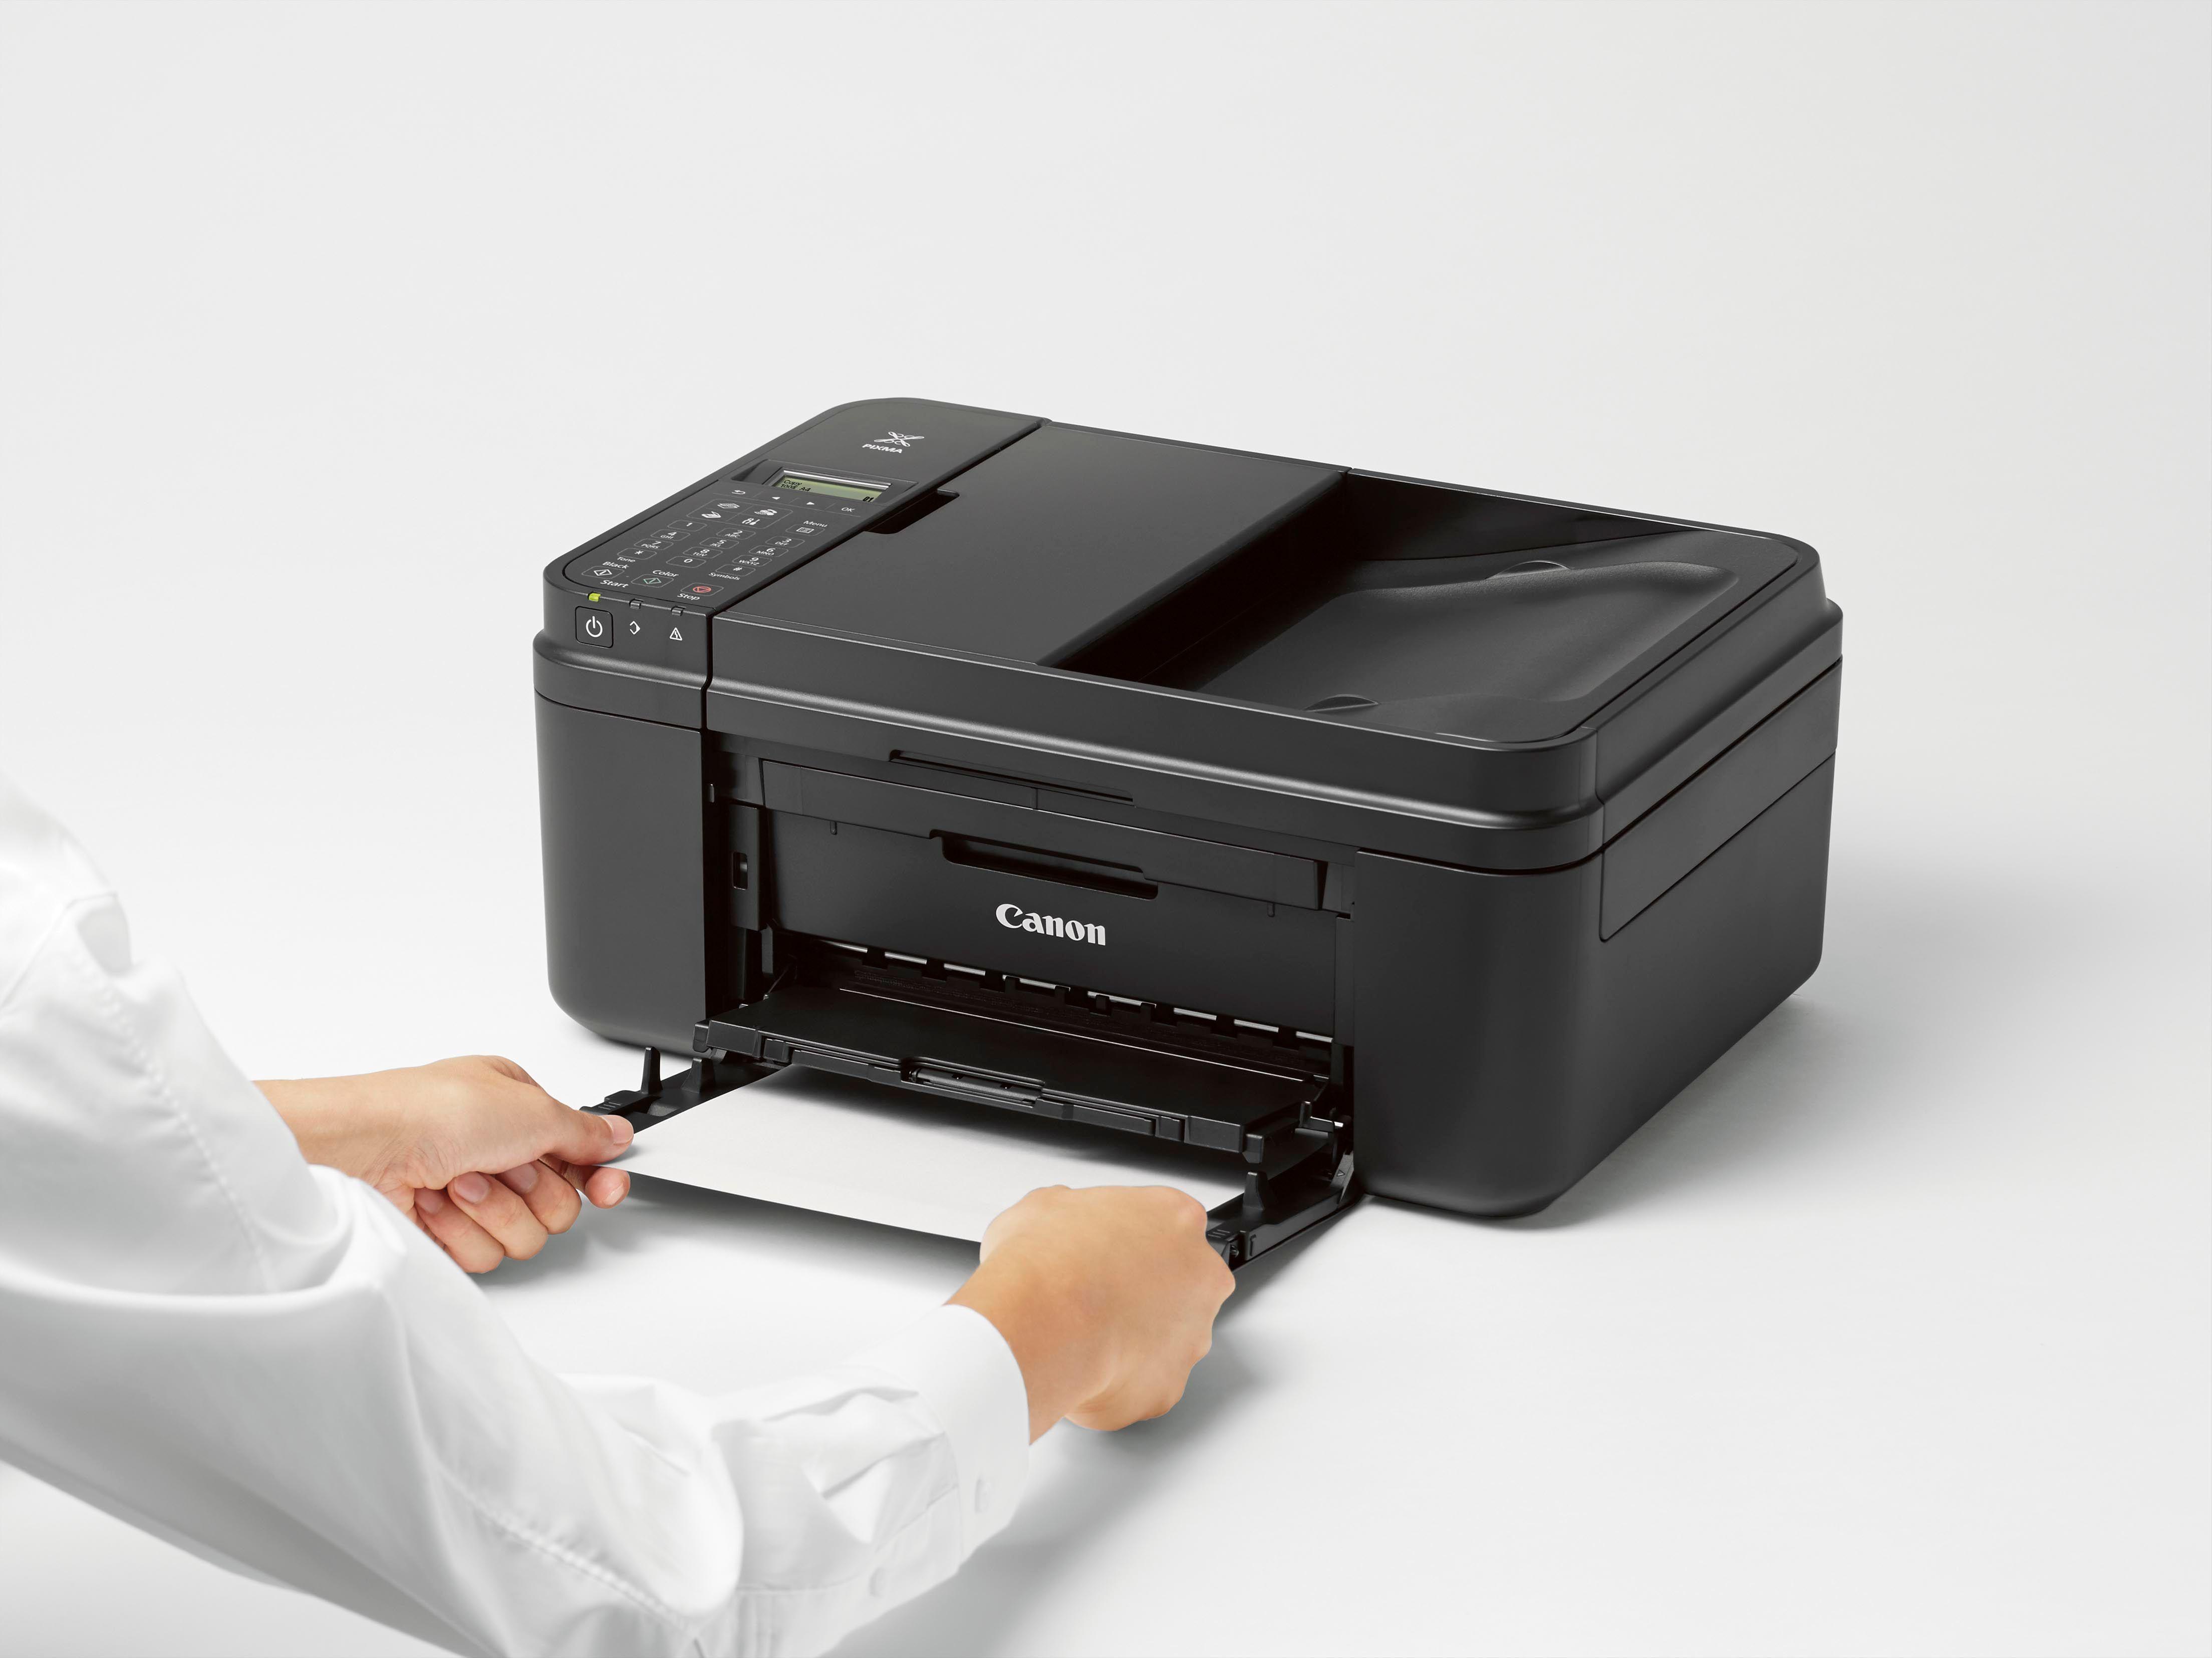 Canon PIXMA MX490 Wireless Office All-in-One Inkjet Printer/Copier